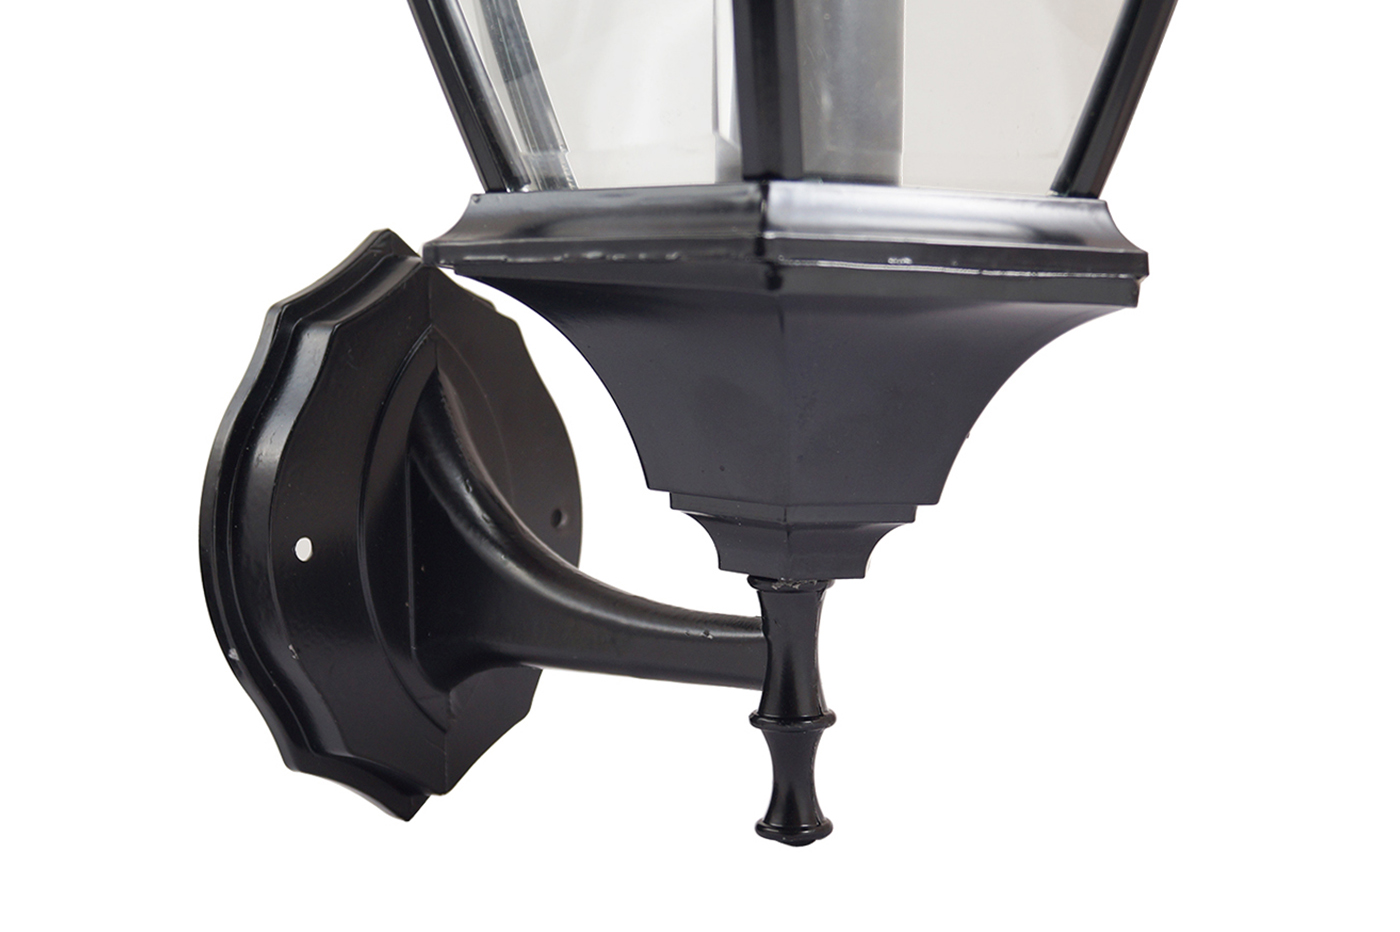 Bes applique beselettronica applique lampada lanterna